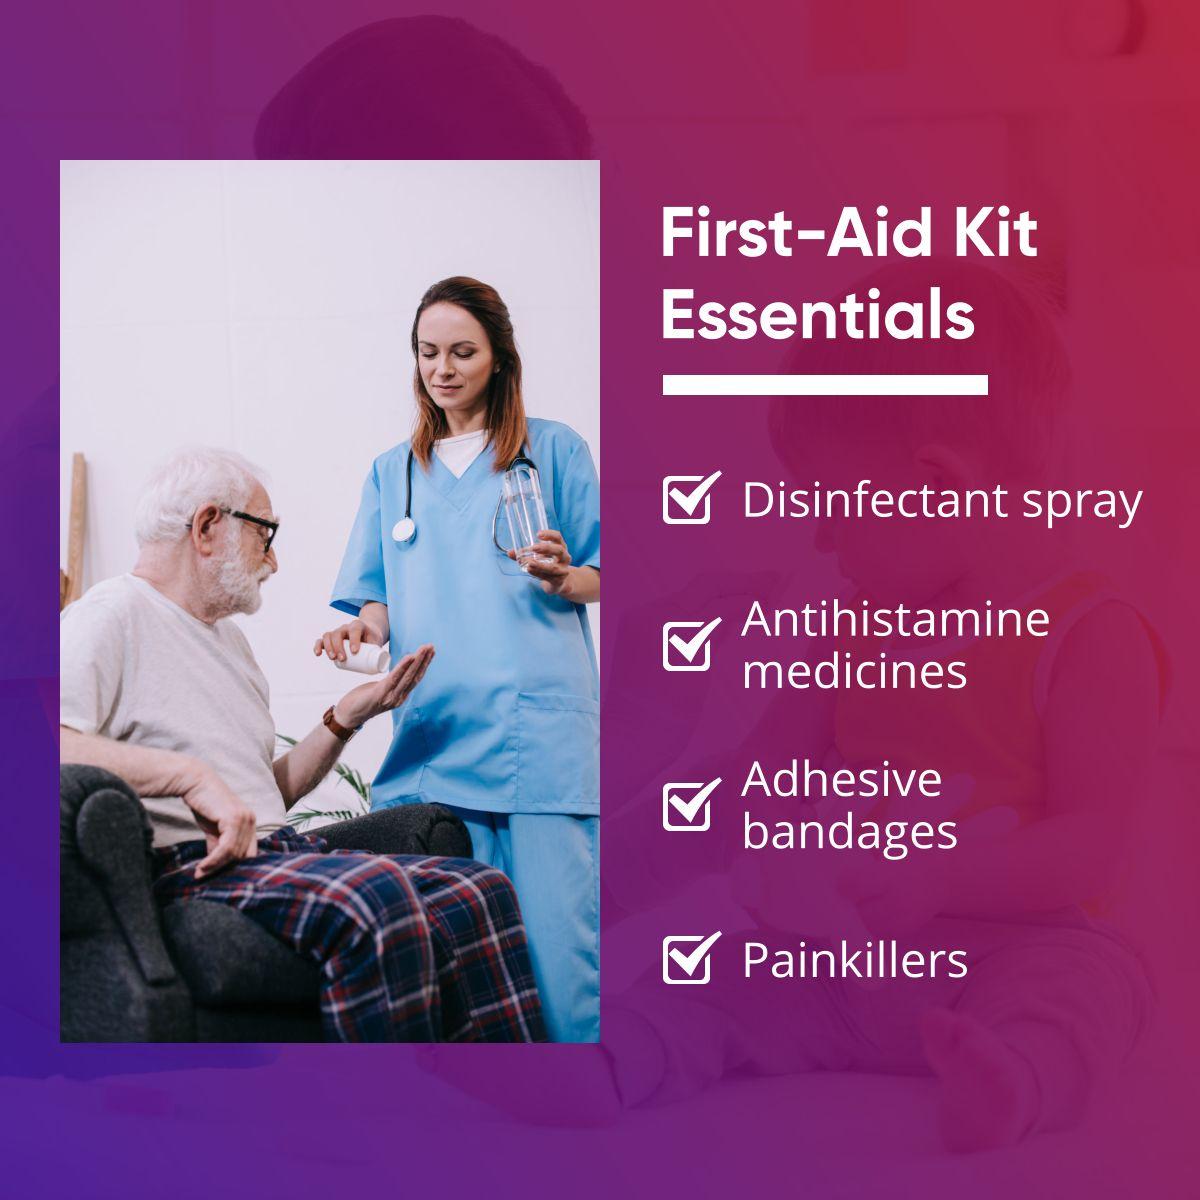 First-Aid Kit Essentials  #SkillcareHealthServicesIncDbaCaringAtHome #FirstAid #firstaid